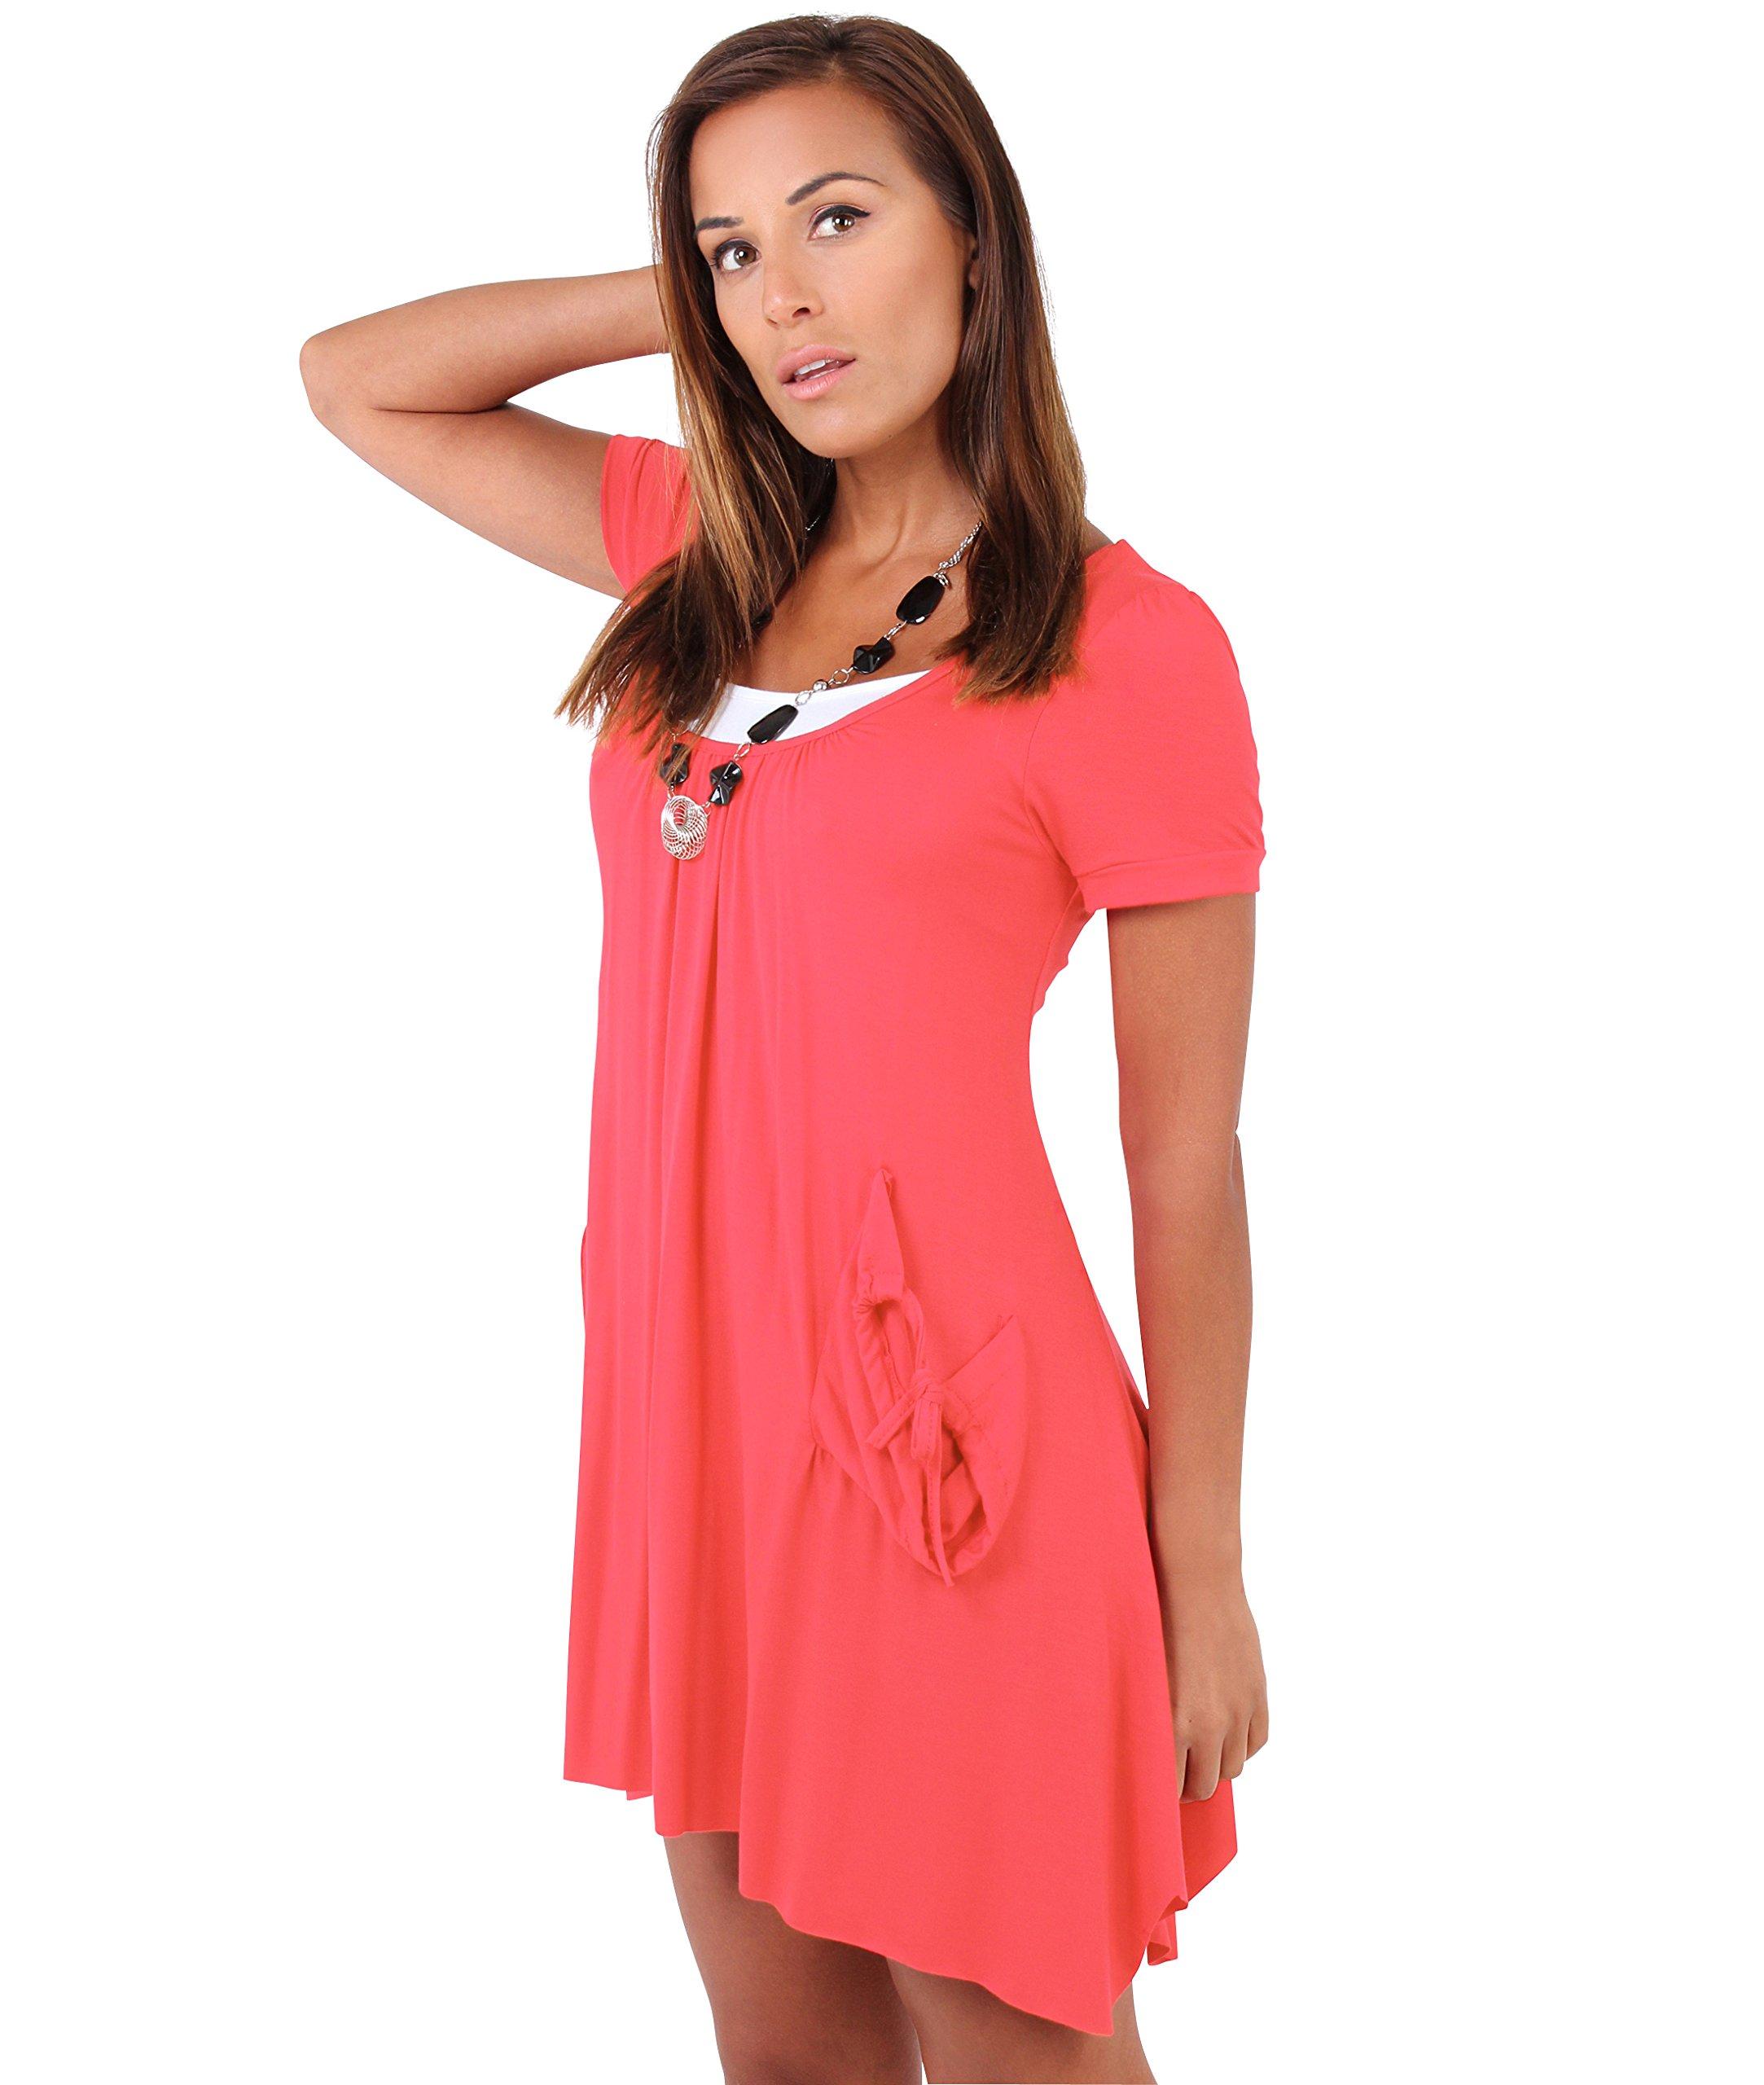 Mini Tunic Dress (Size UK 10, US 4), Coral (3984)